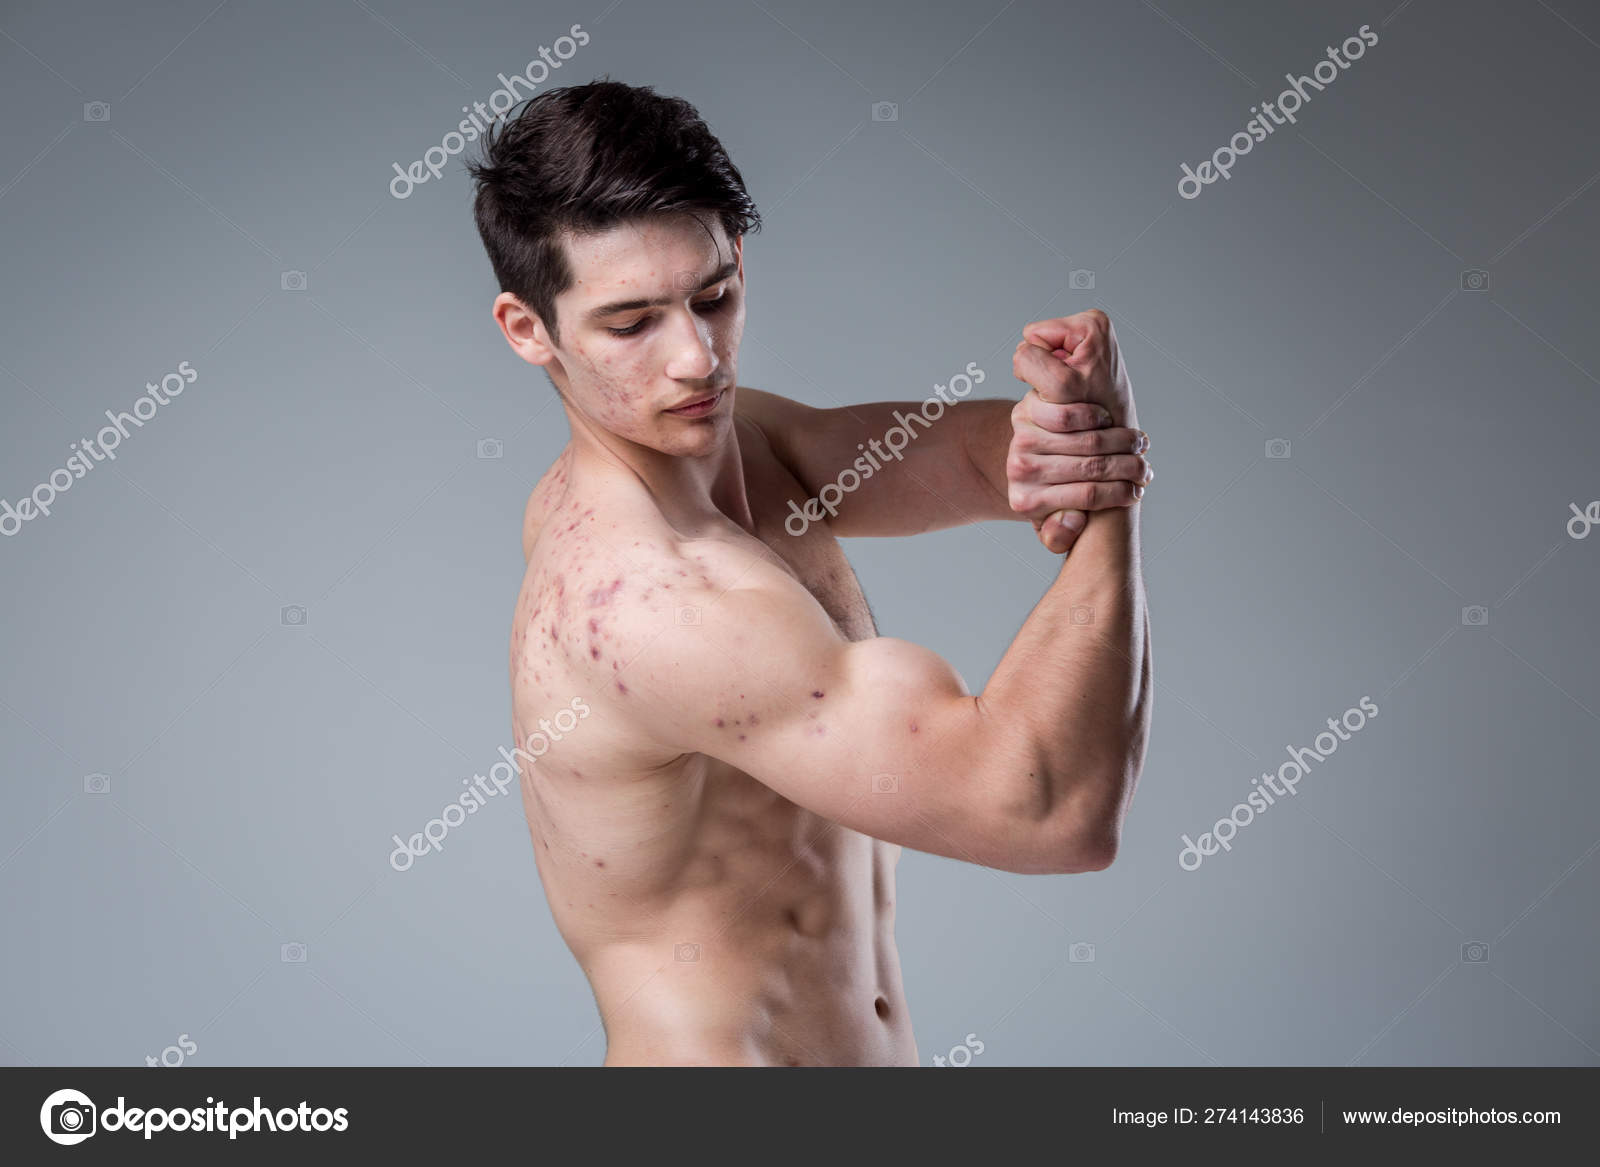 Studio portrait young Caucasian man on gray background posing  theme